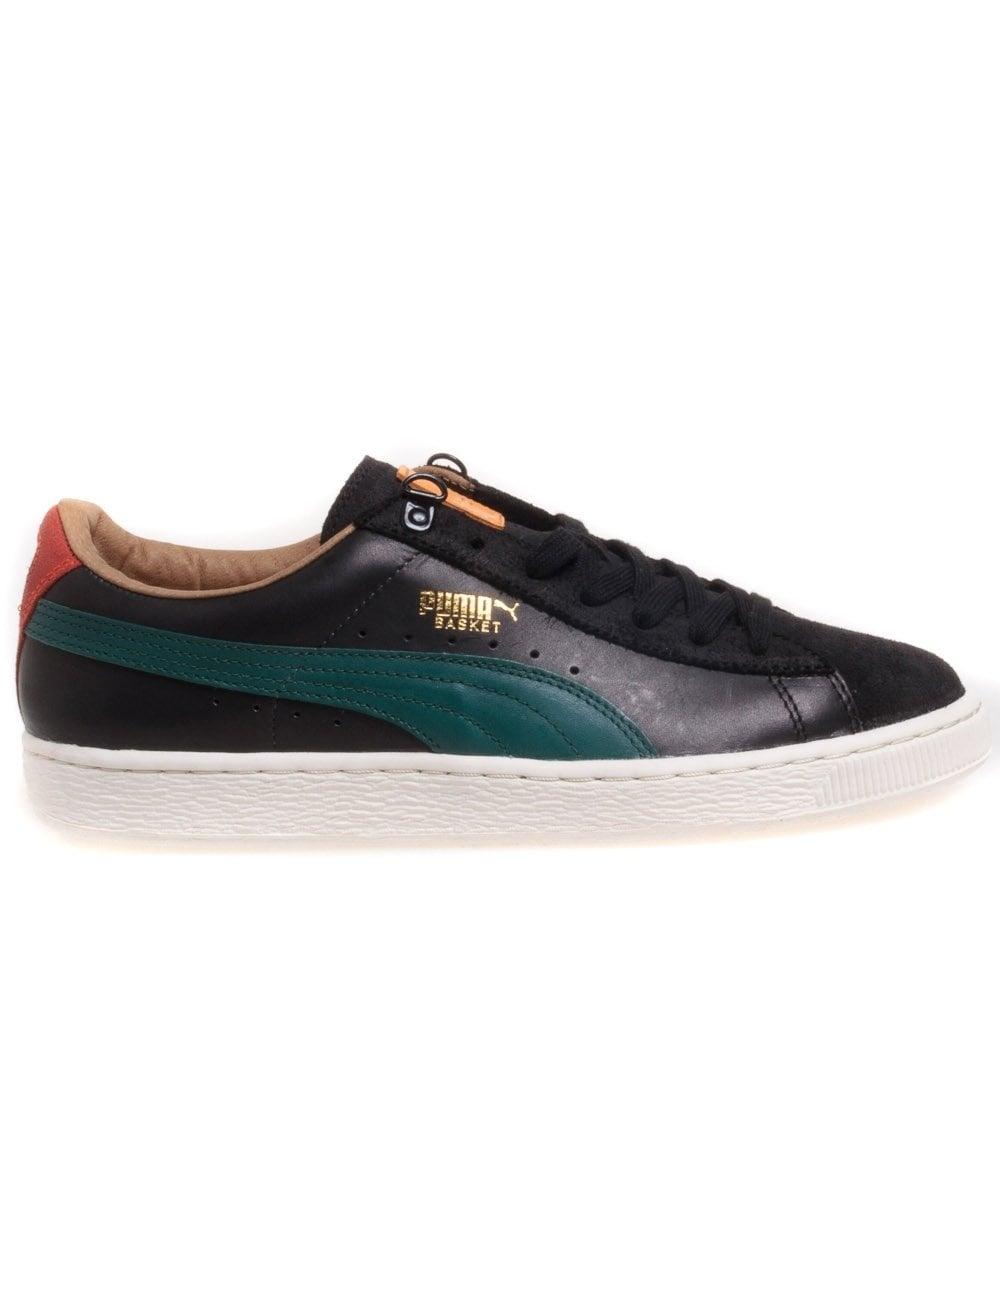 new style d0f03 a2c31 Puma MMQ Heritage Basket Classic - Black/Deep Teal - Footwear from ...